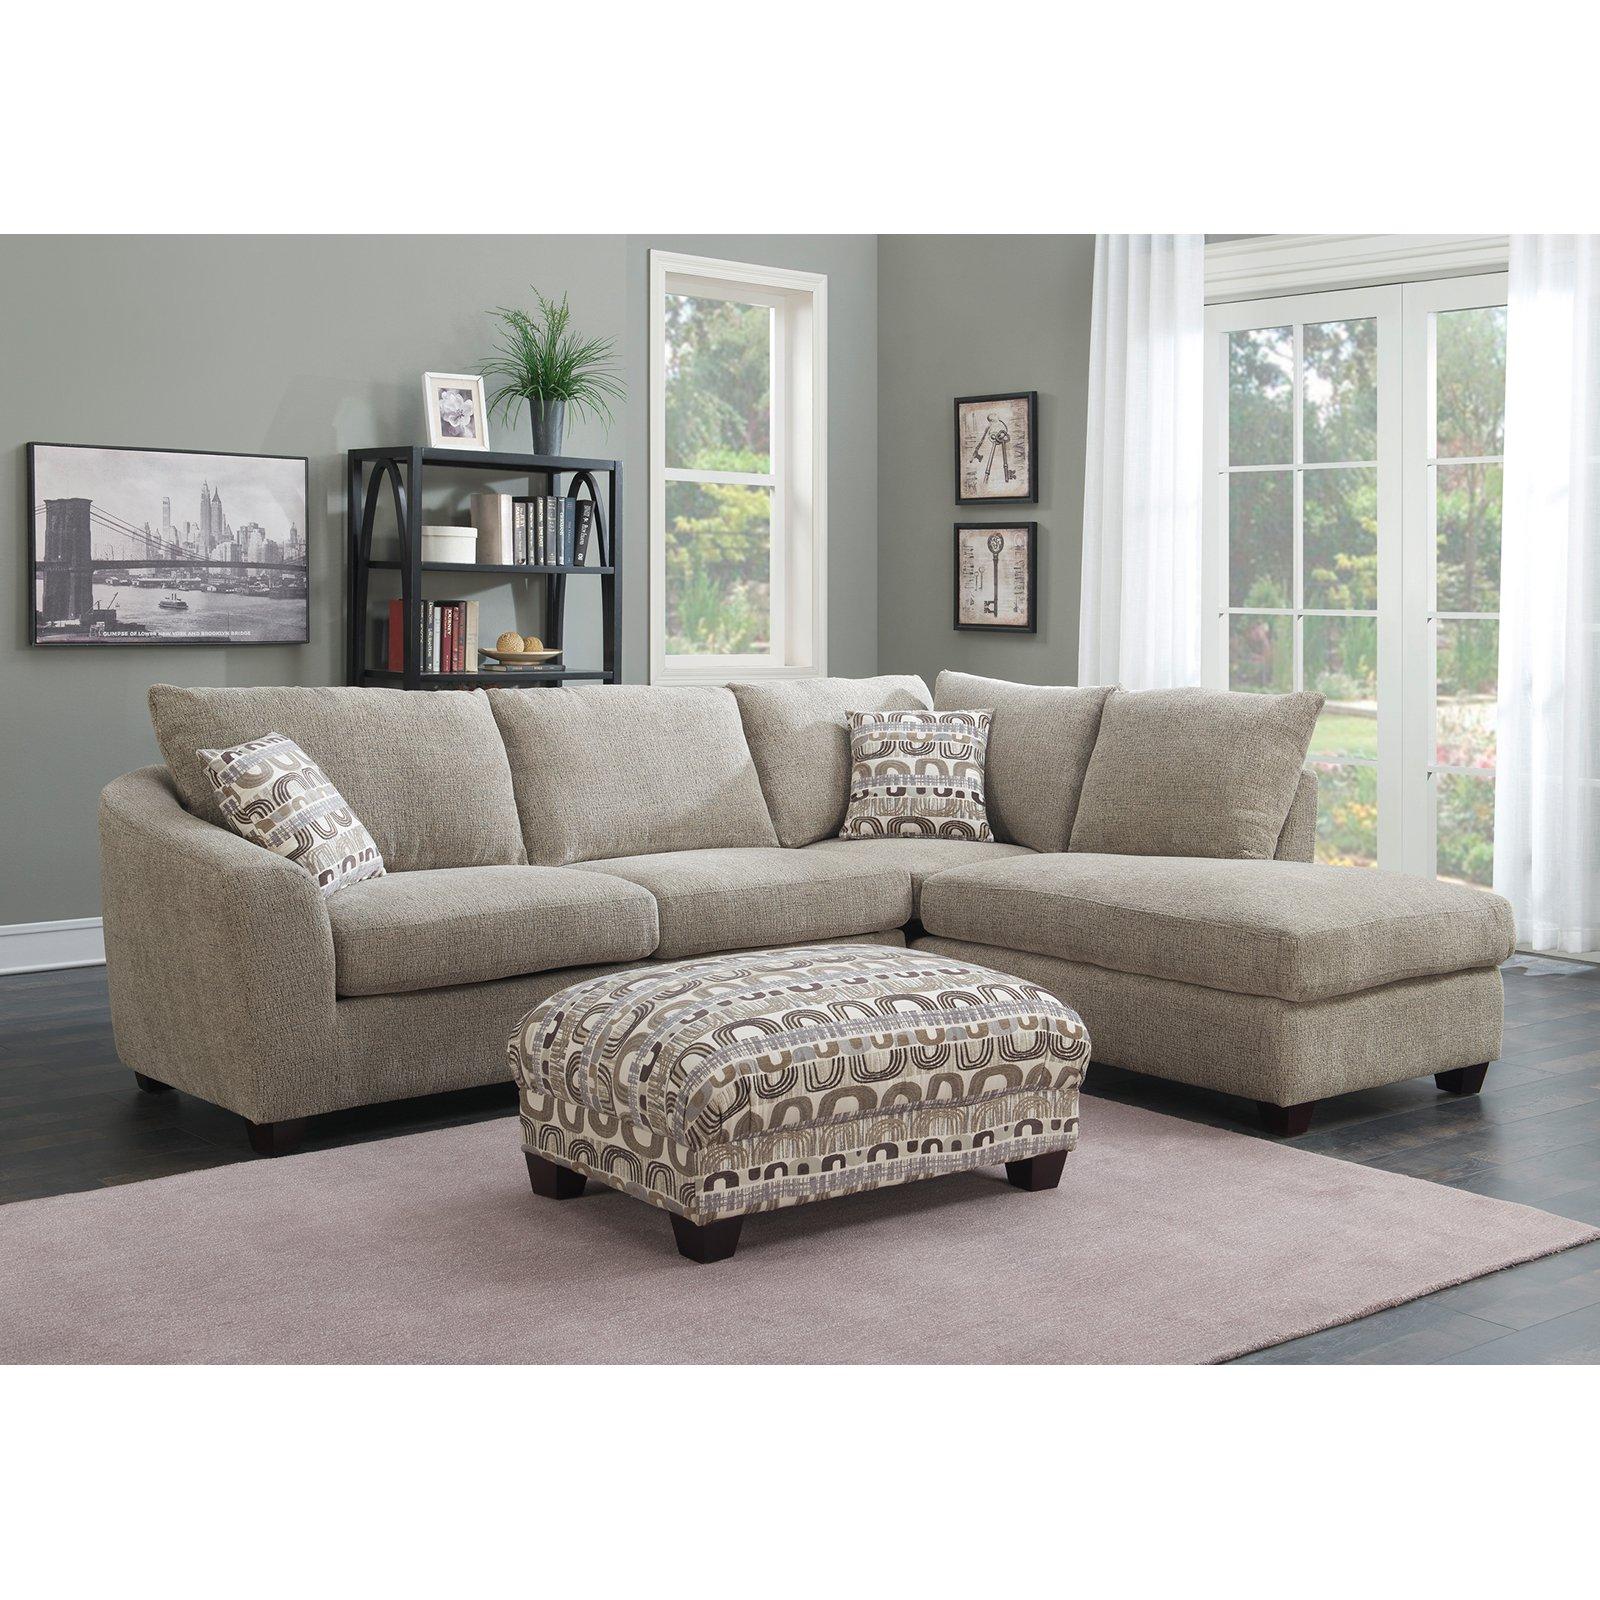 Emerald Home Urbana 2 Piece Sectional Sofa With Chaise Walmartcom